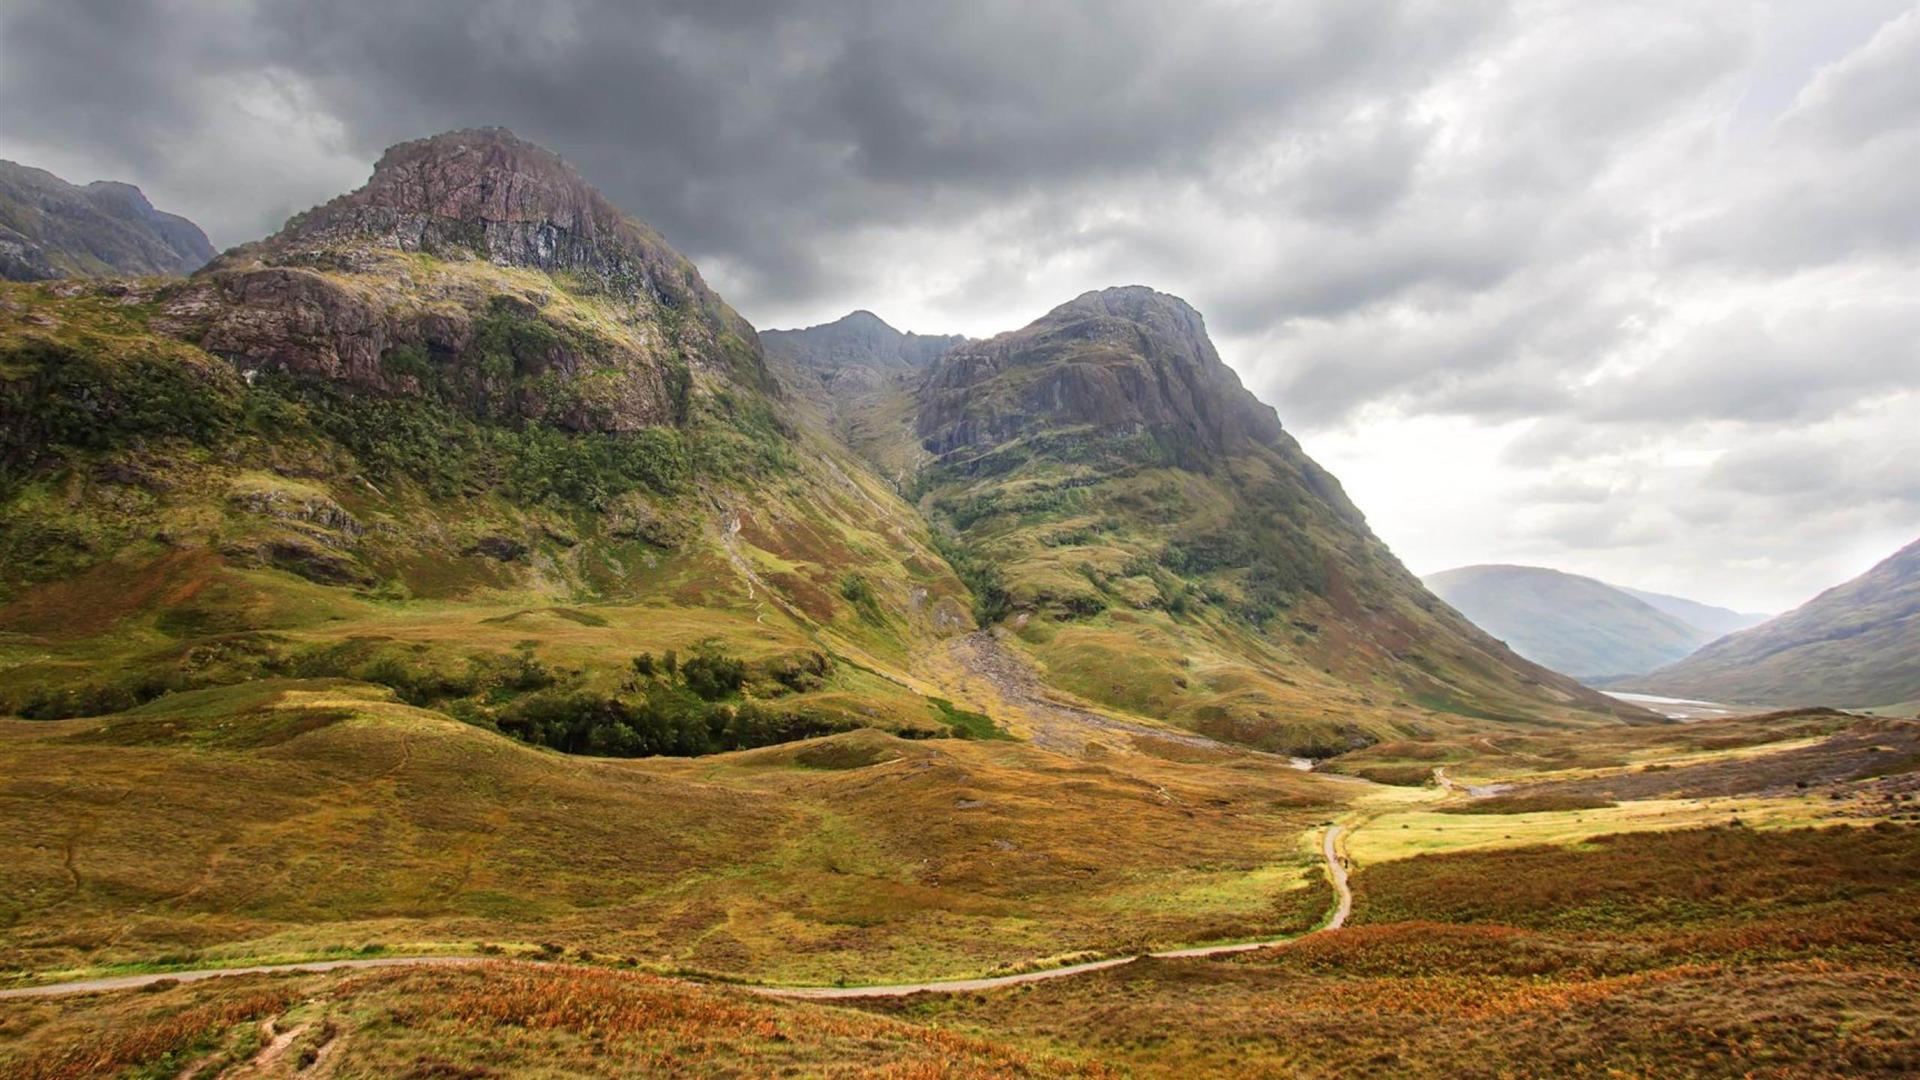 Glencoe valley united states 2012 landscape selected wallpaper 1920x1080 download - Highland park wallpaper ...